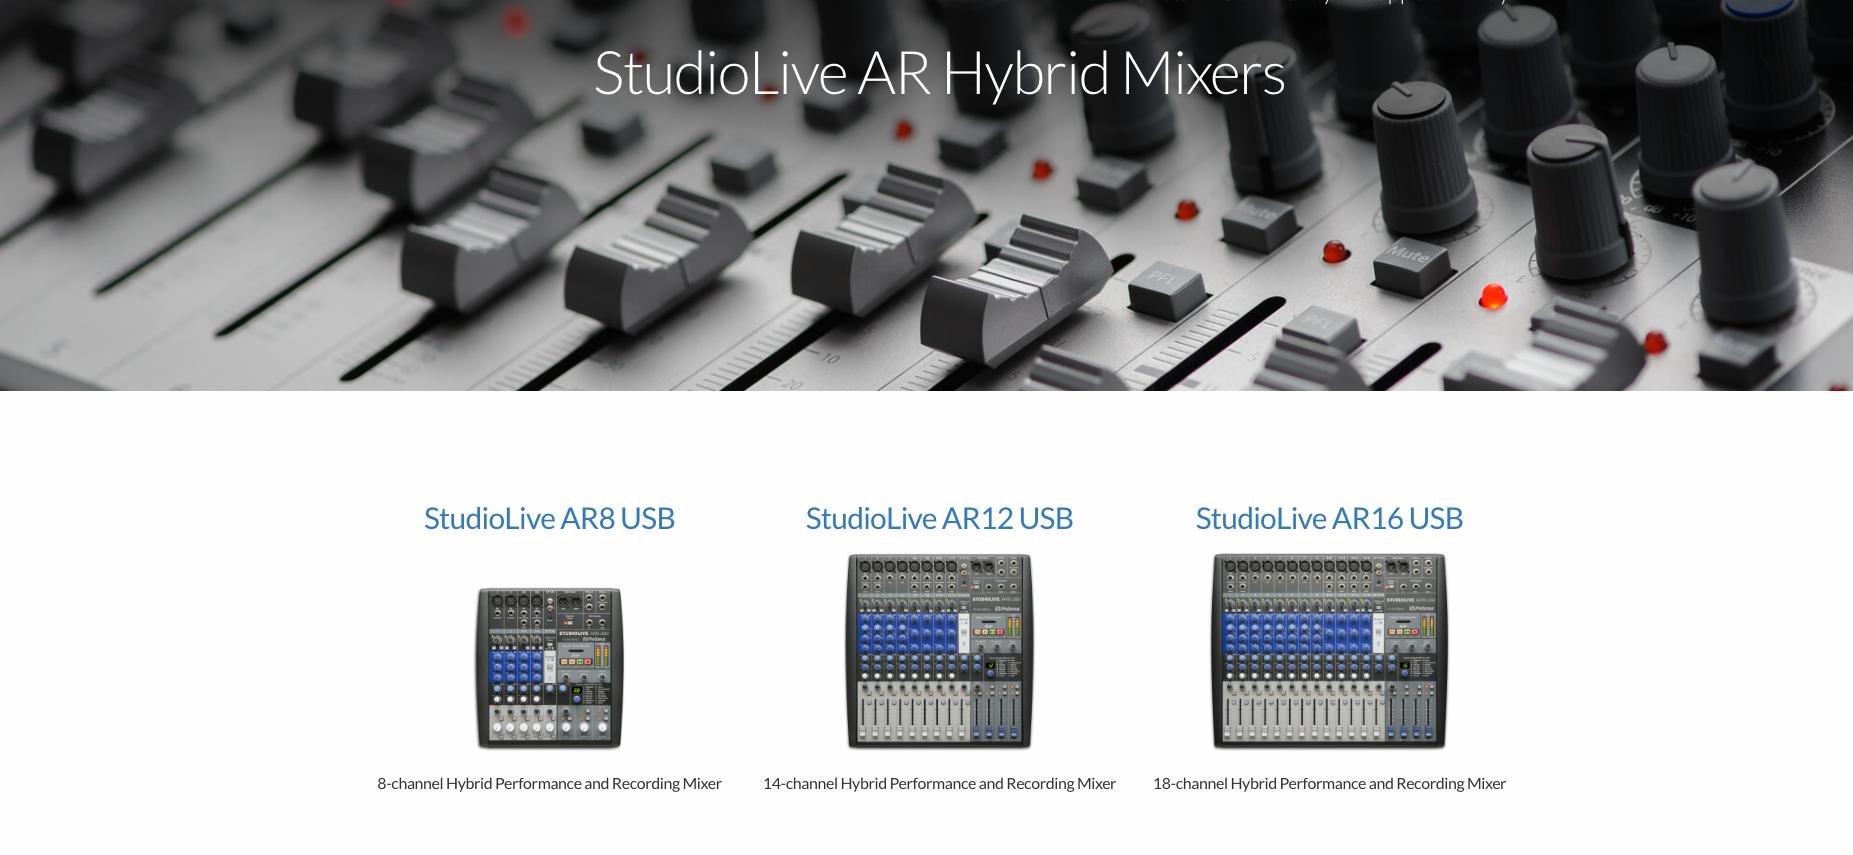 StudioLIve AR Hybrid Mixers